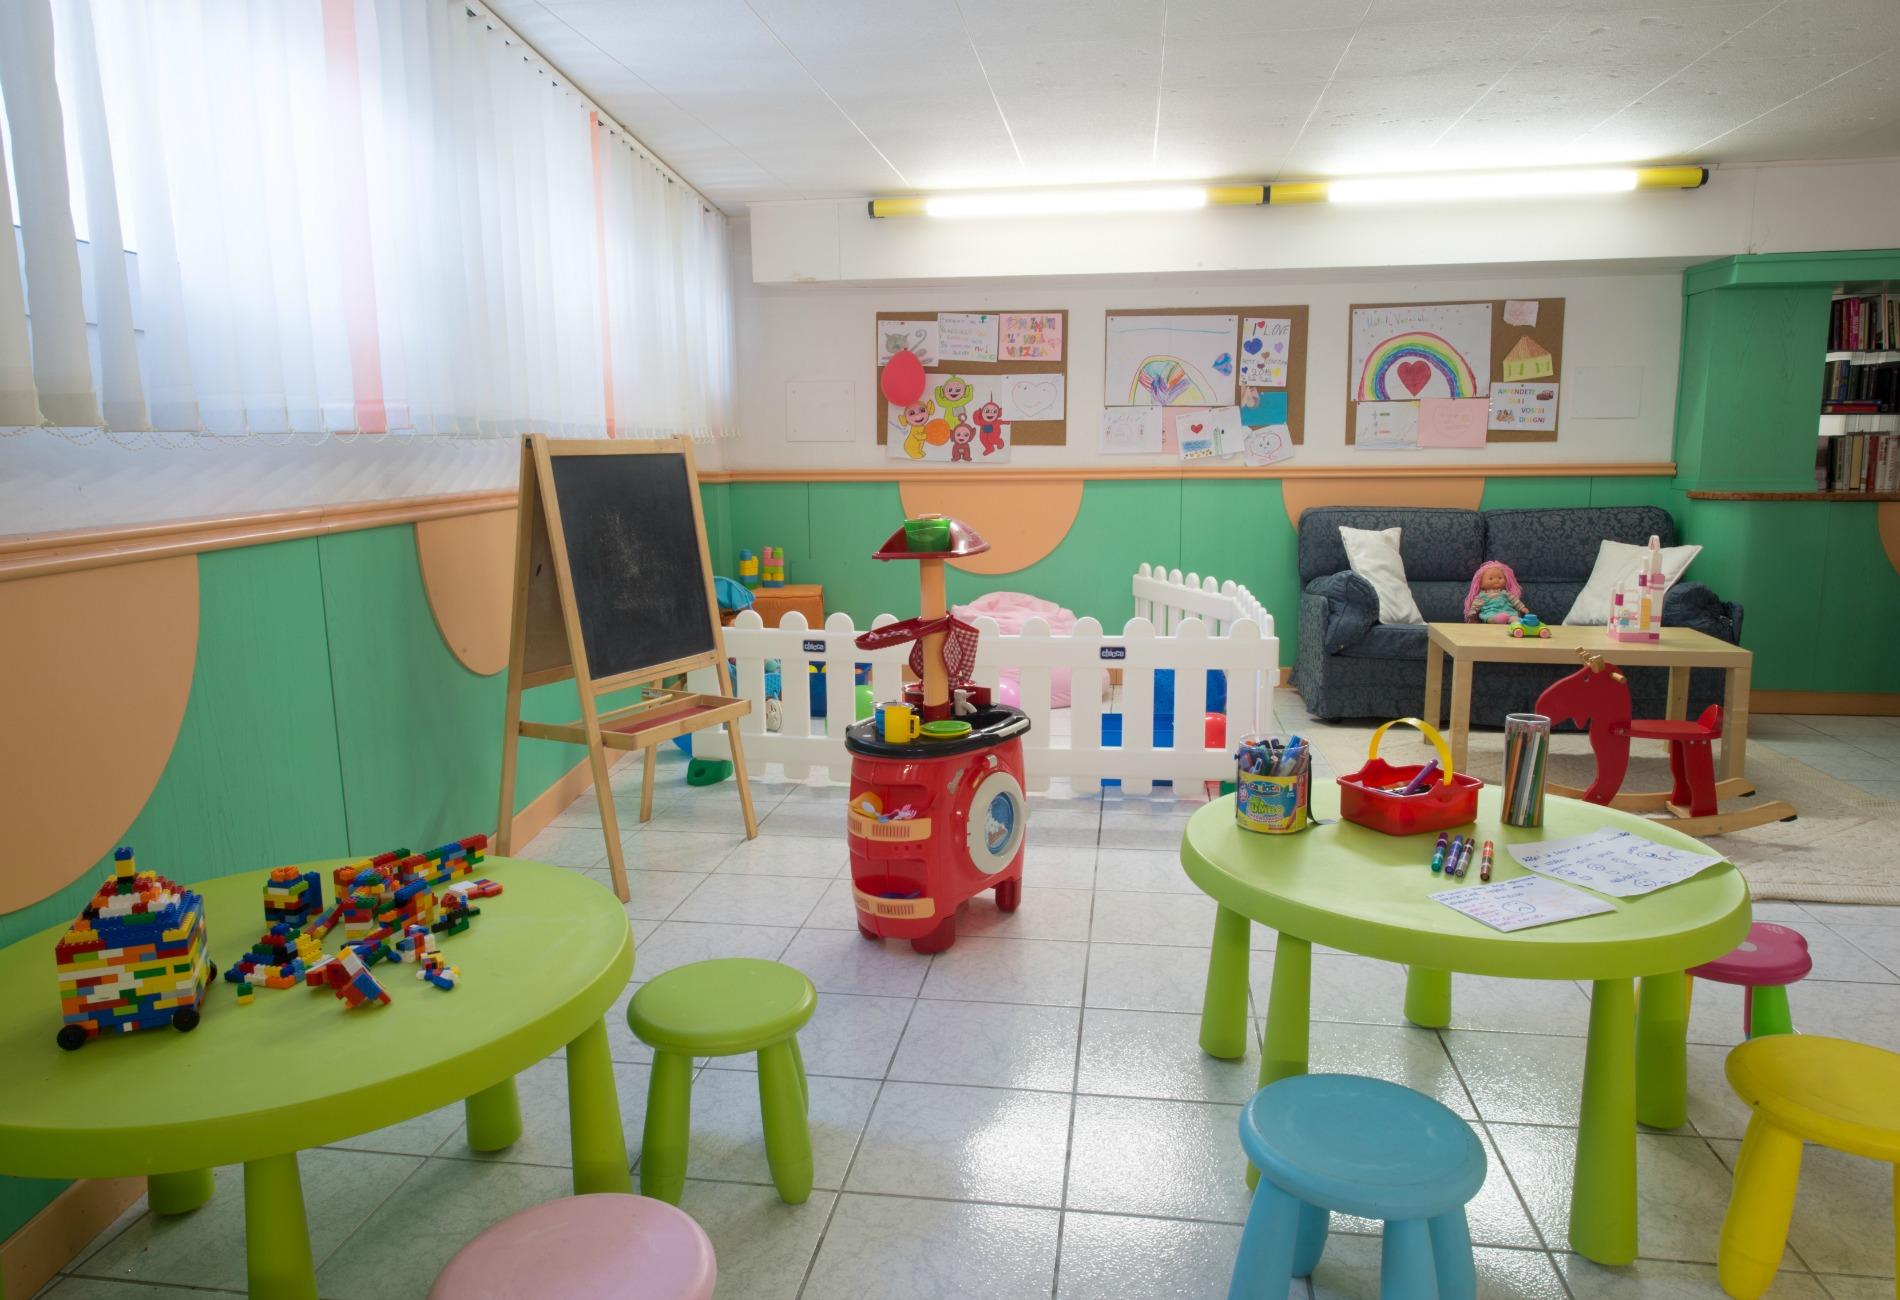 http://www.hotelvenezuela.it/wp-content/uploads/2016/12/saletta-1.jpeg